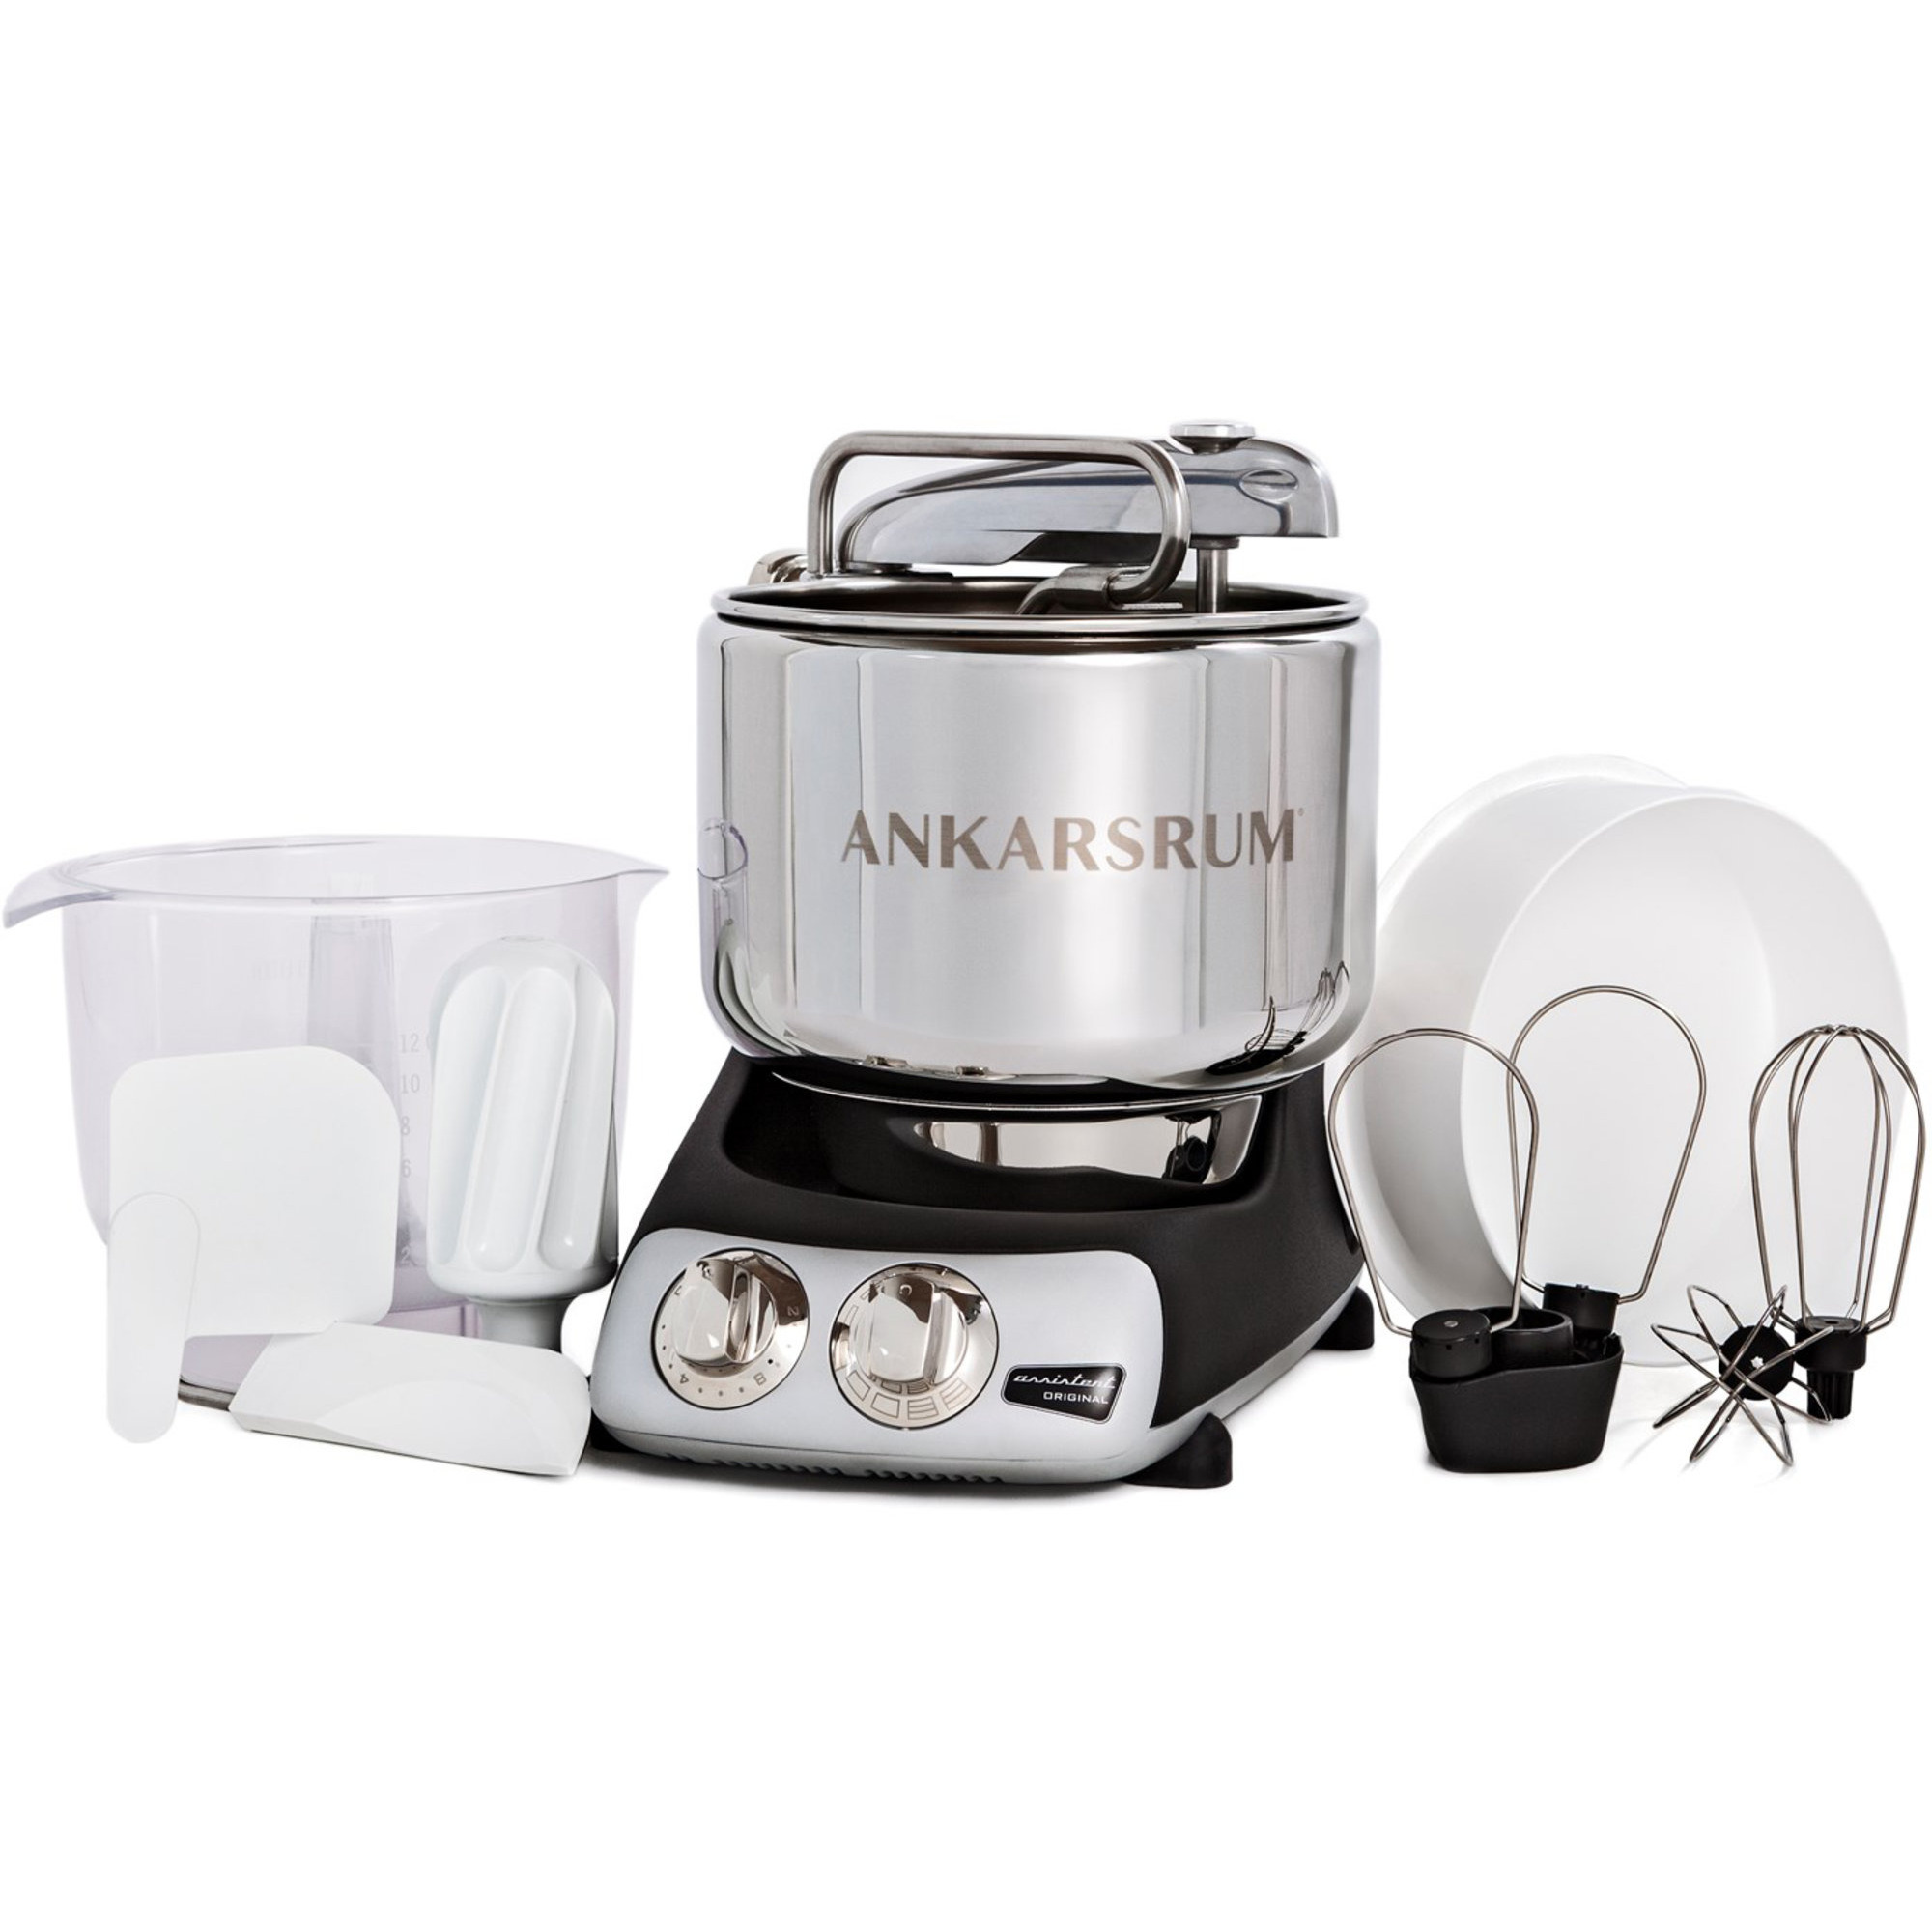 AKM 6220 røremaskine fra Ankarsrum » Kompakt og effektiv køkkenmaskine